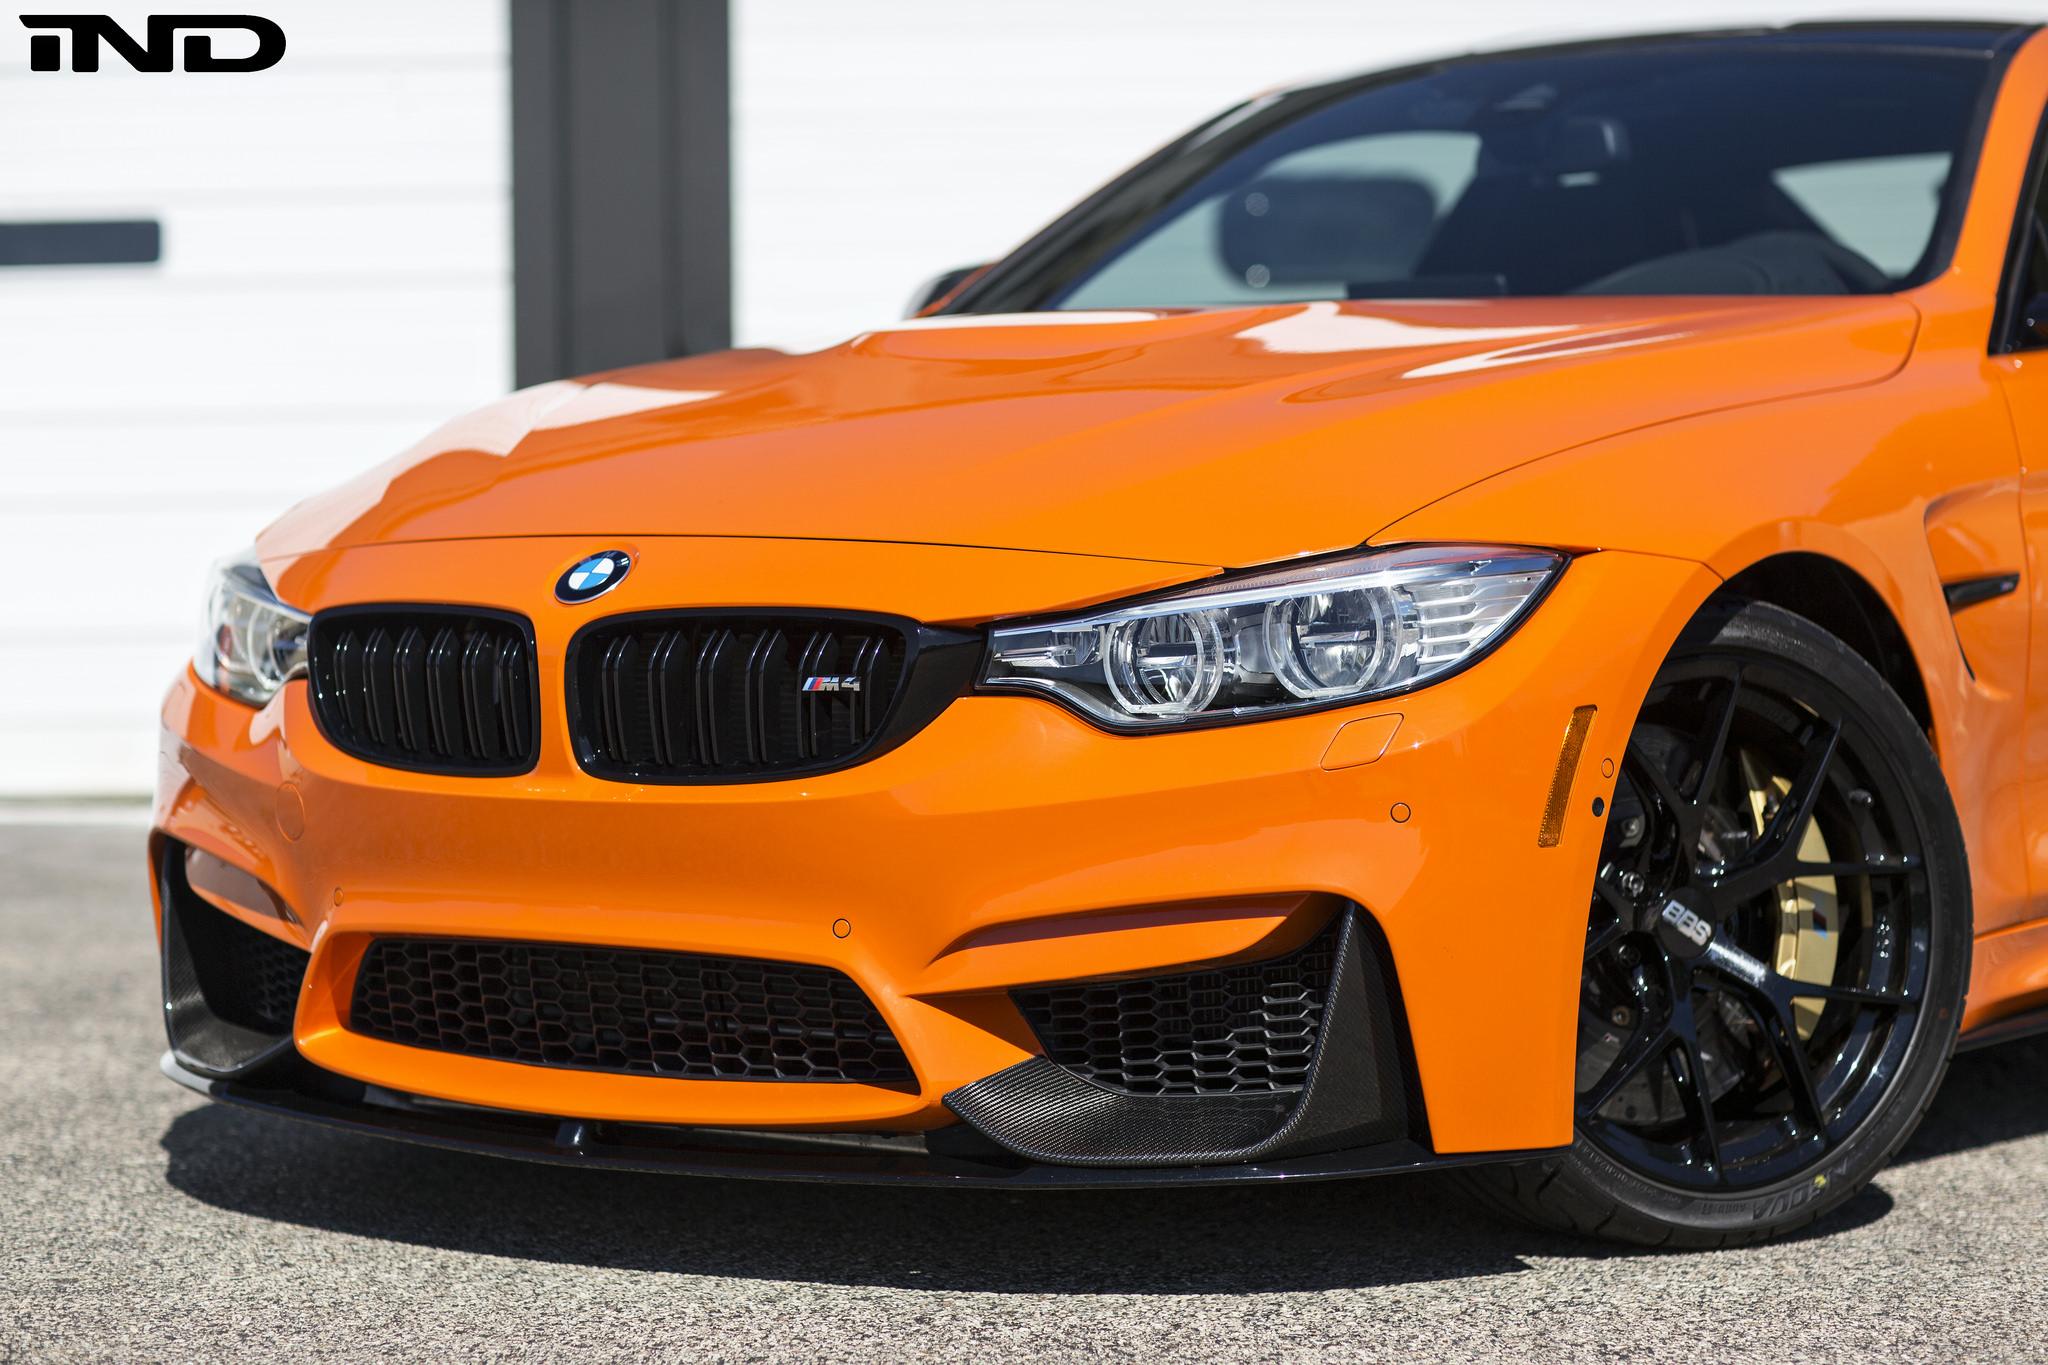 Fire Orange Bmw M4 Modded By Ind Distribution